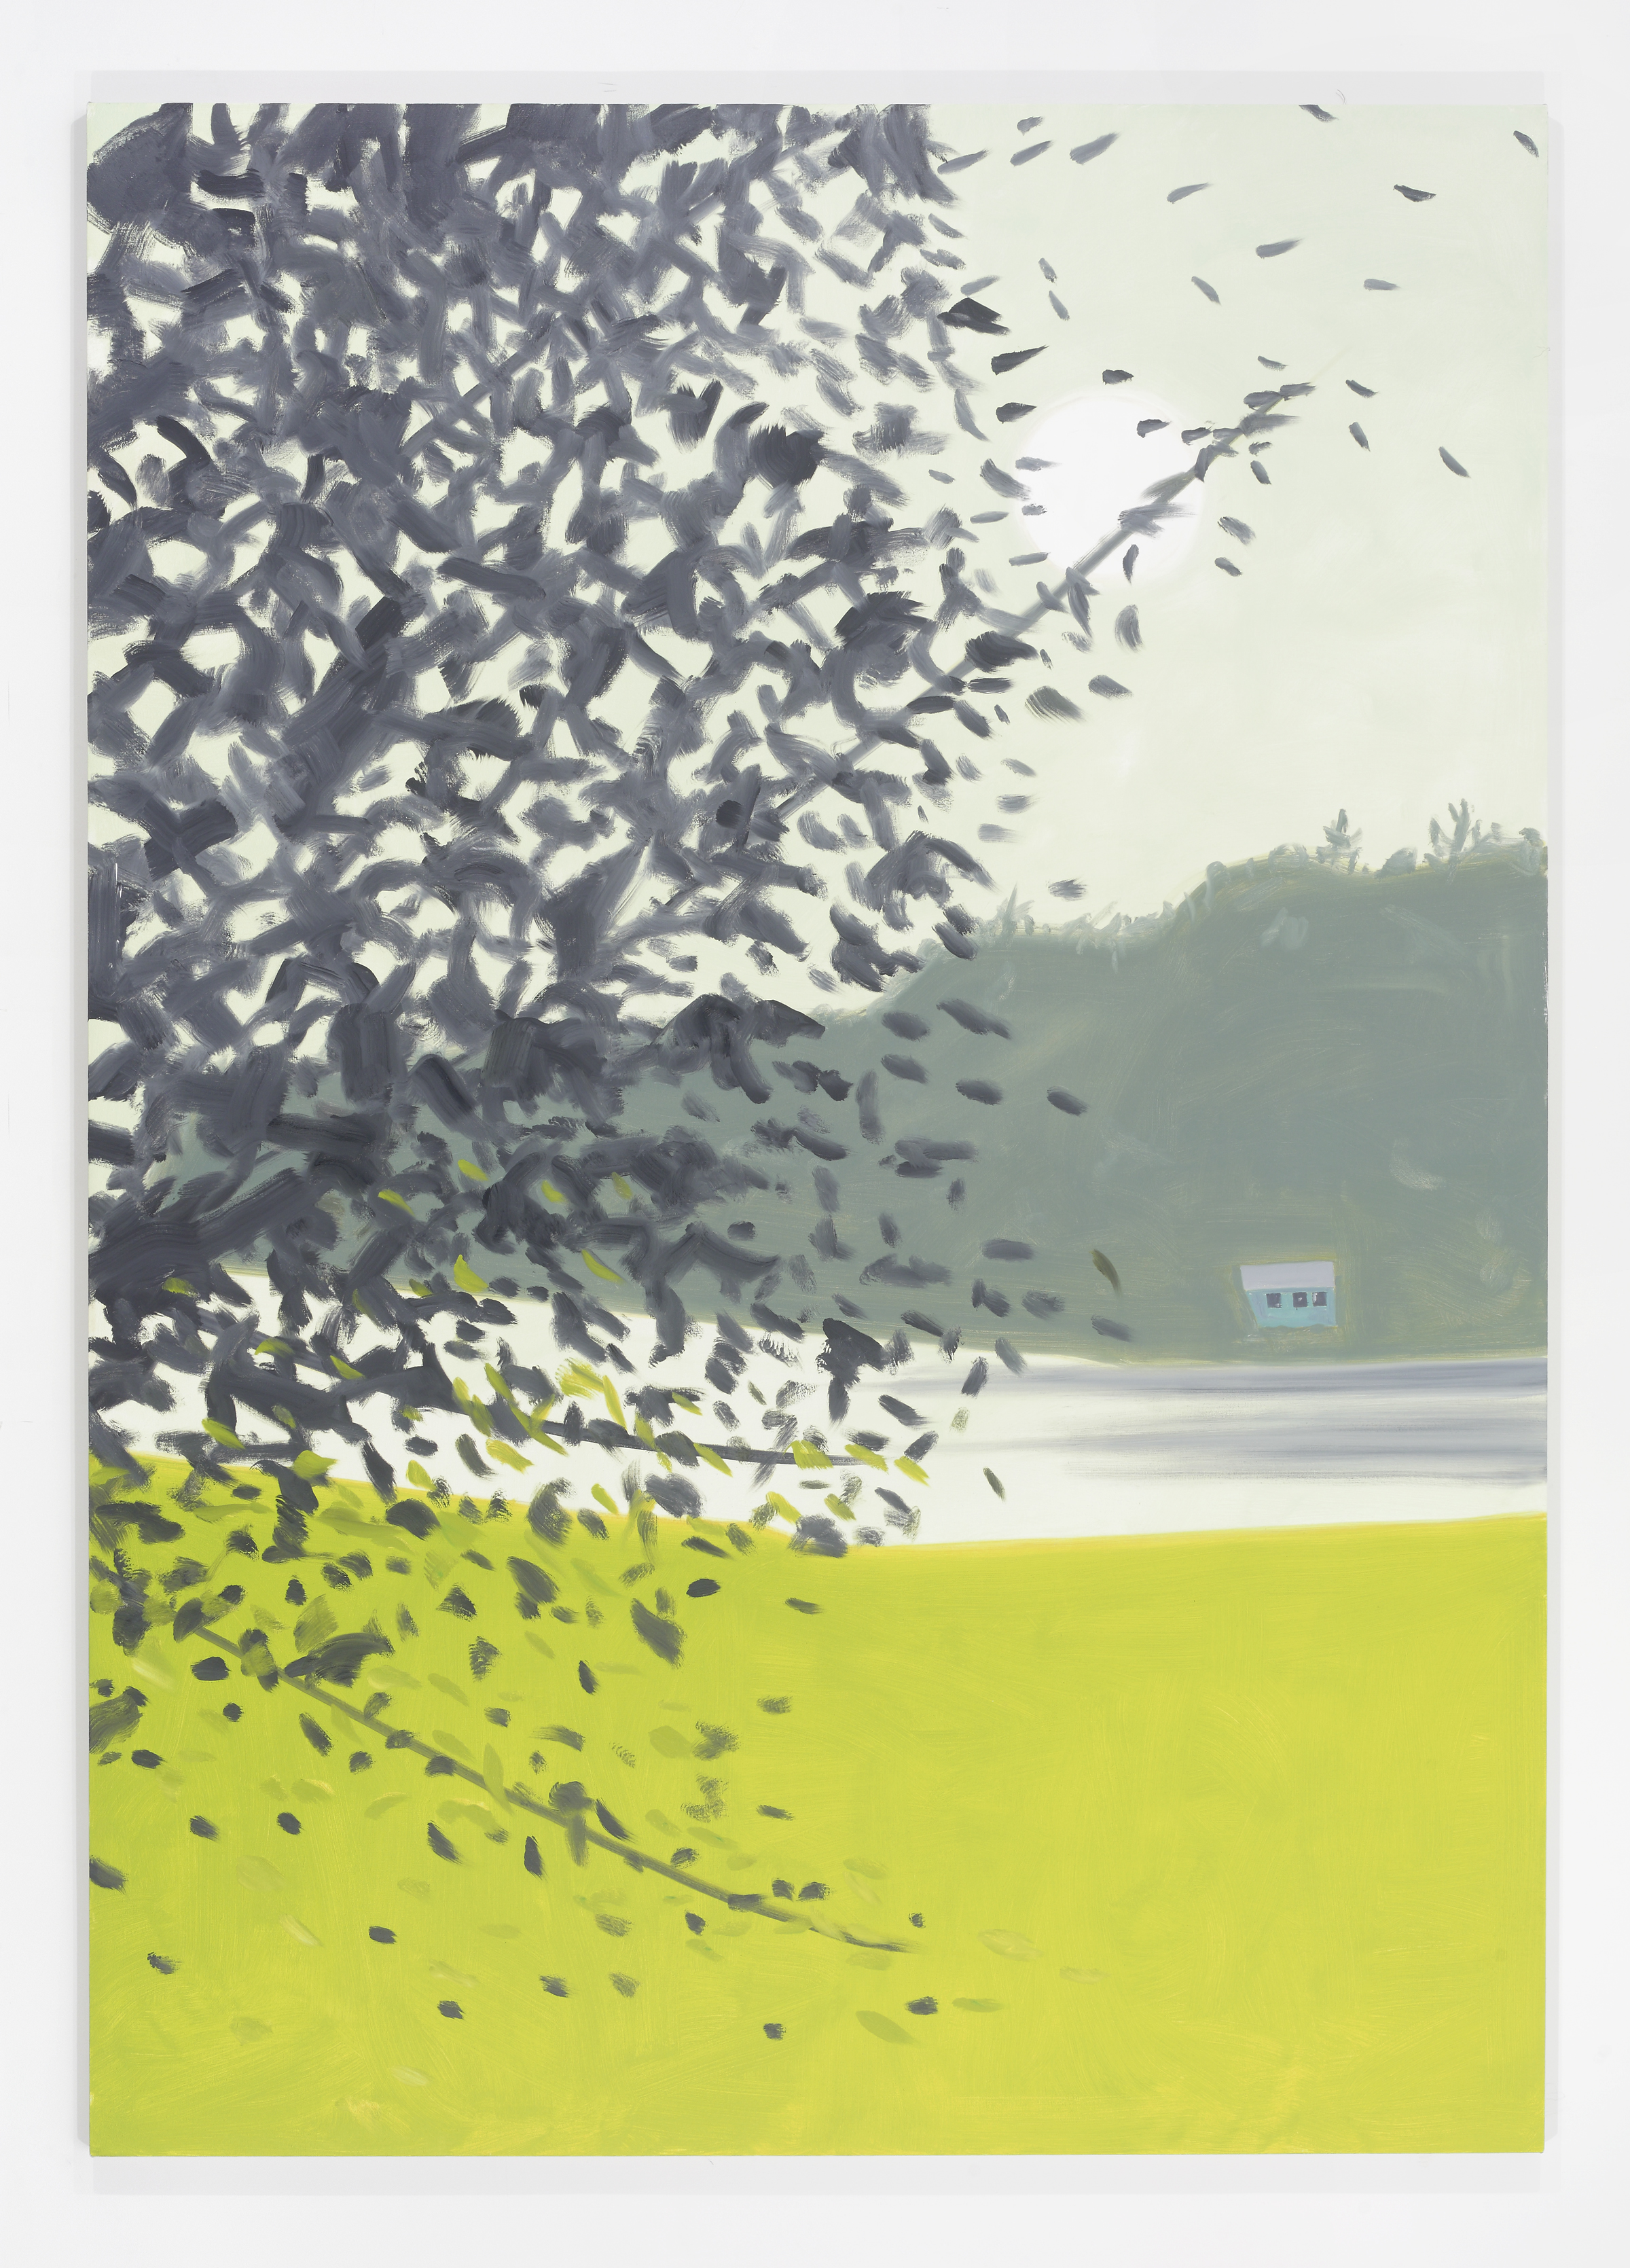 Alex Katz 4 pm, 2014; Oil on linen, 365.8 x 274.3 cm; The Collection of Marguerite Steed Hoffman; Courtesy of Gavin Brown's enterprise; © Alex Katz, DACS, London/VAGA, New York 2016; Photograph: Paul Takeuchi